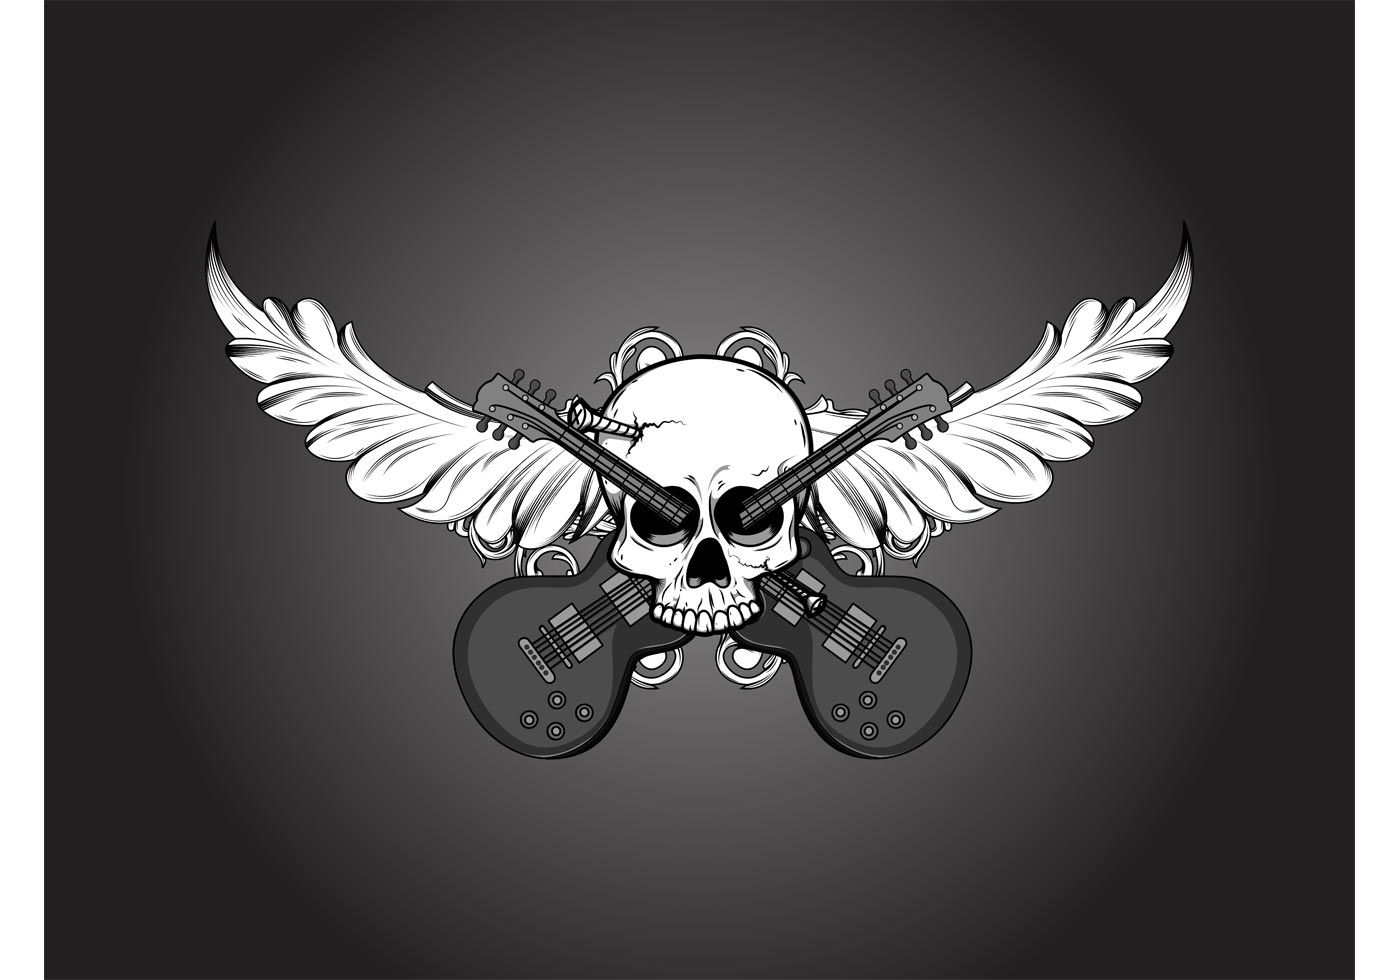 Motor Skull Download Free Vector Art Stock Graphics